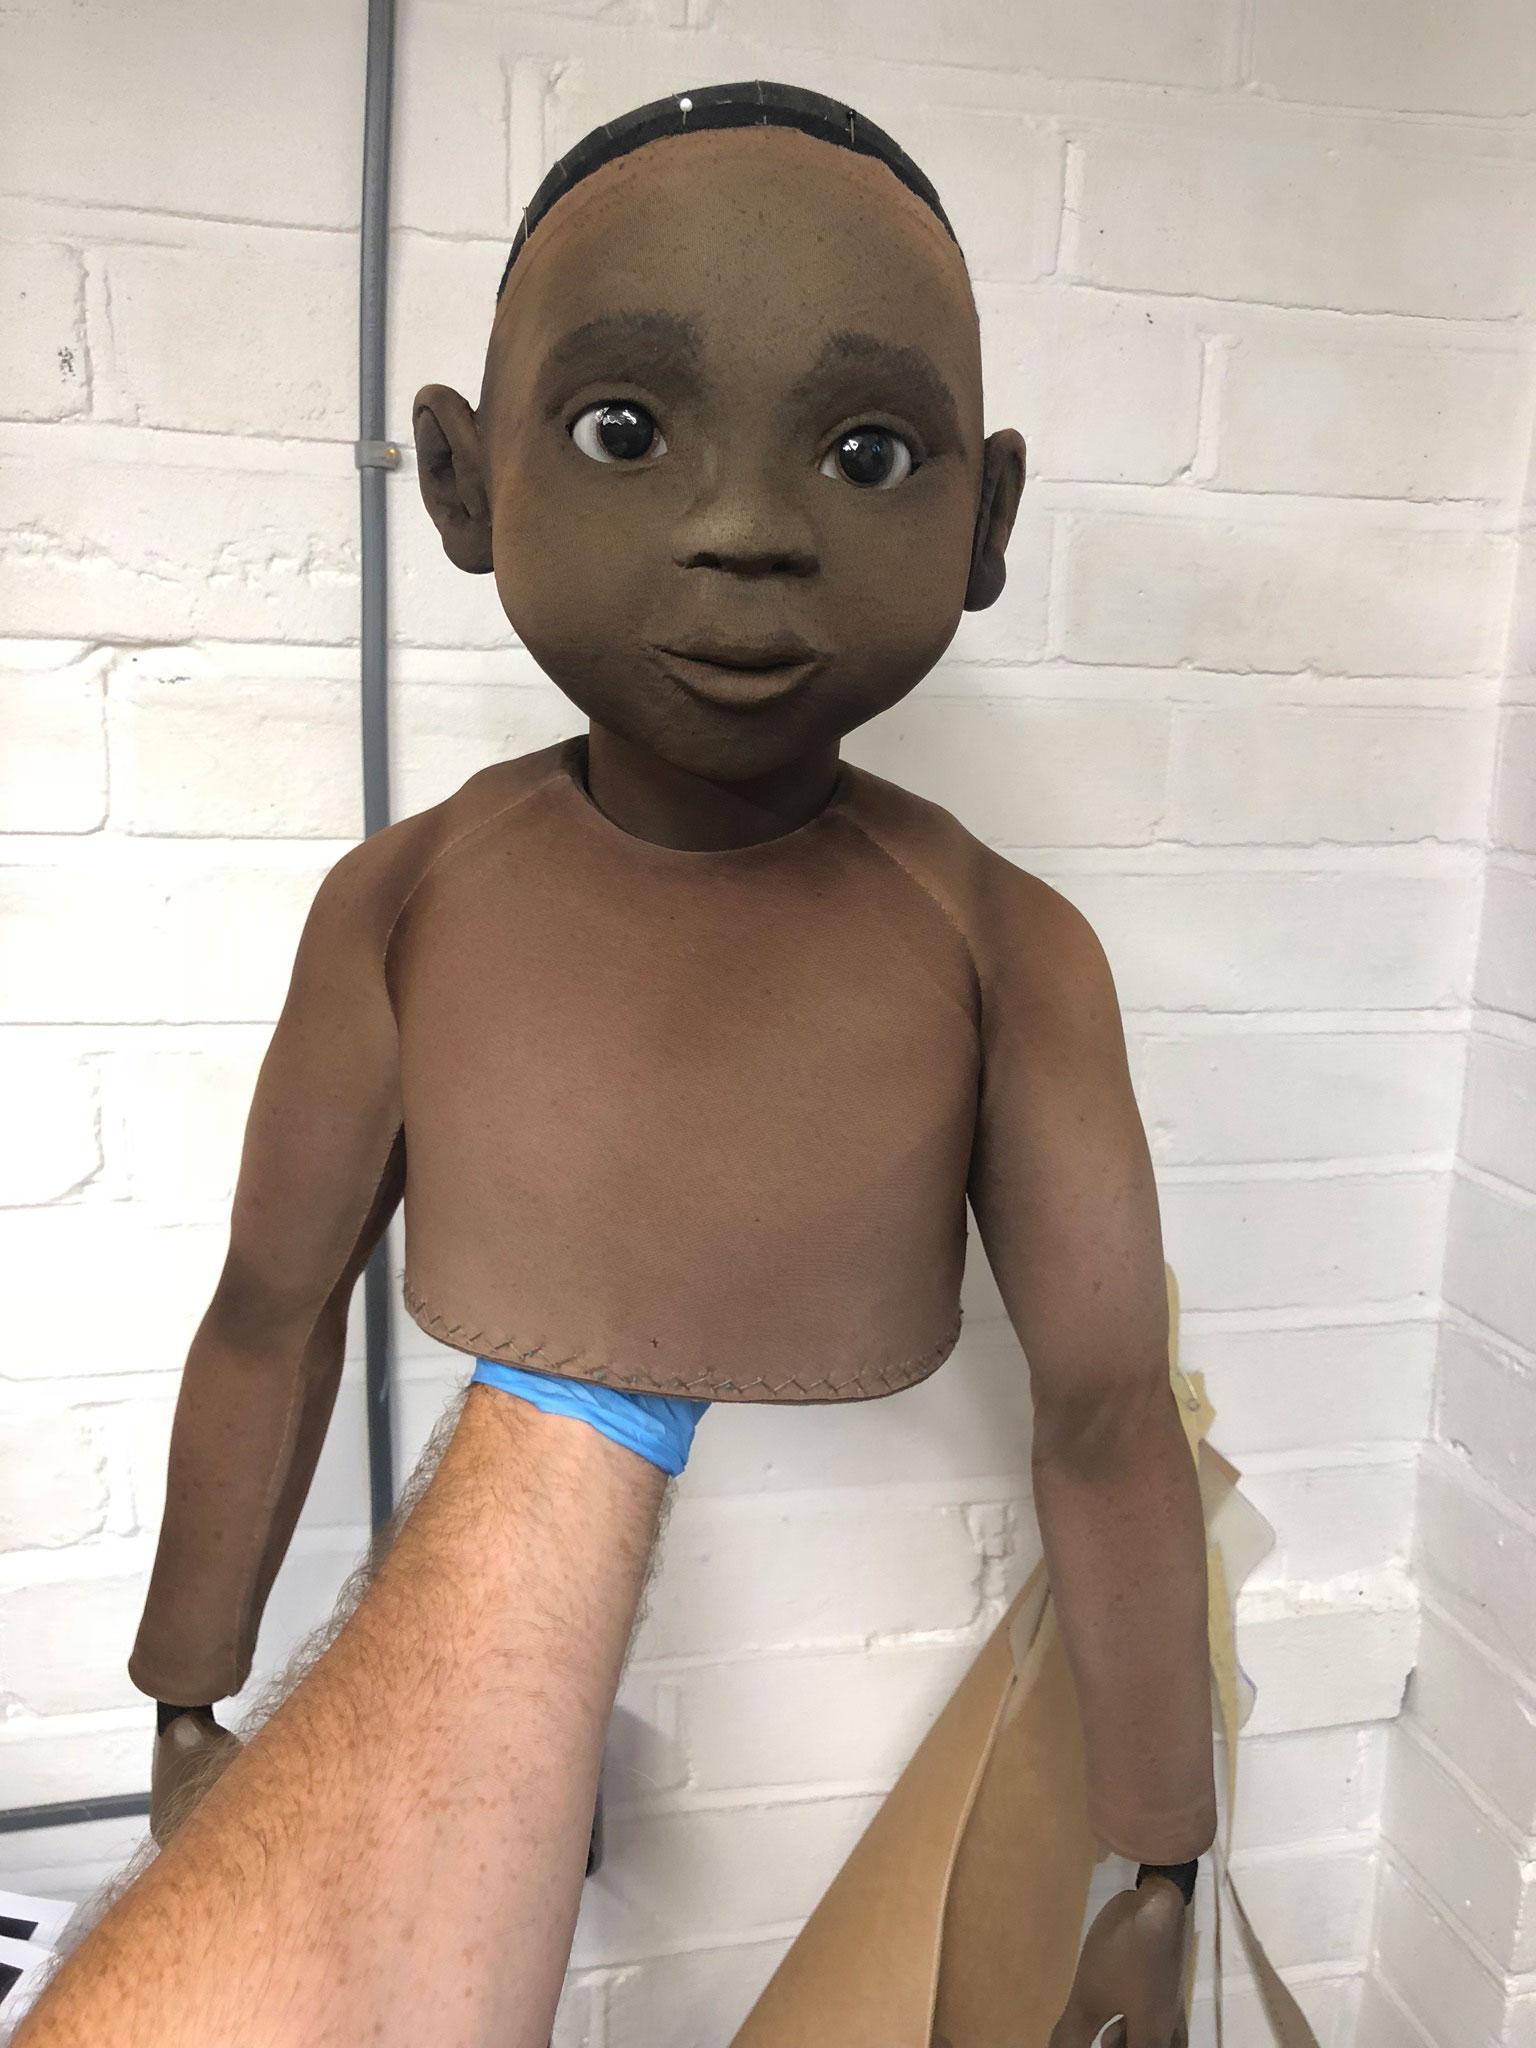 Puppet design